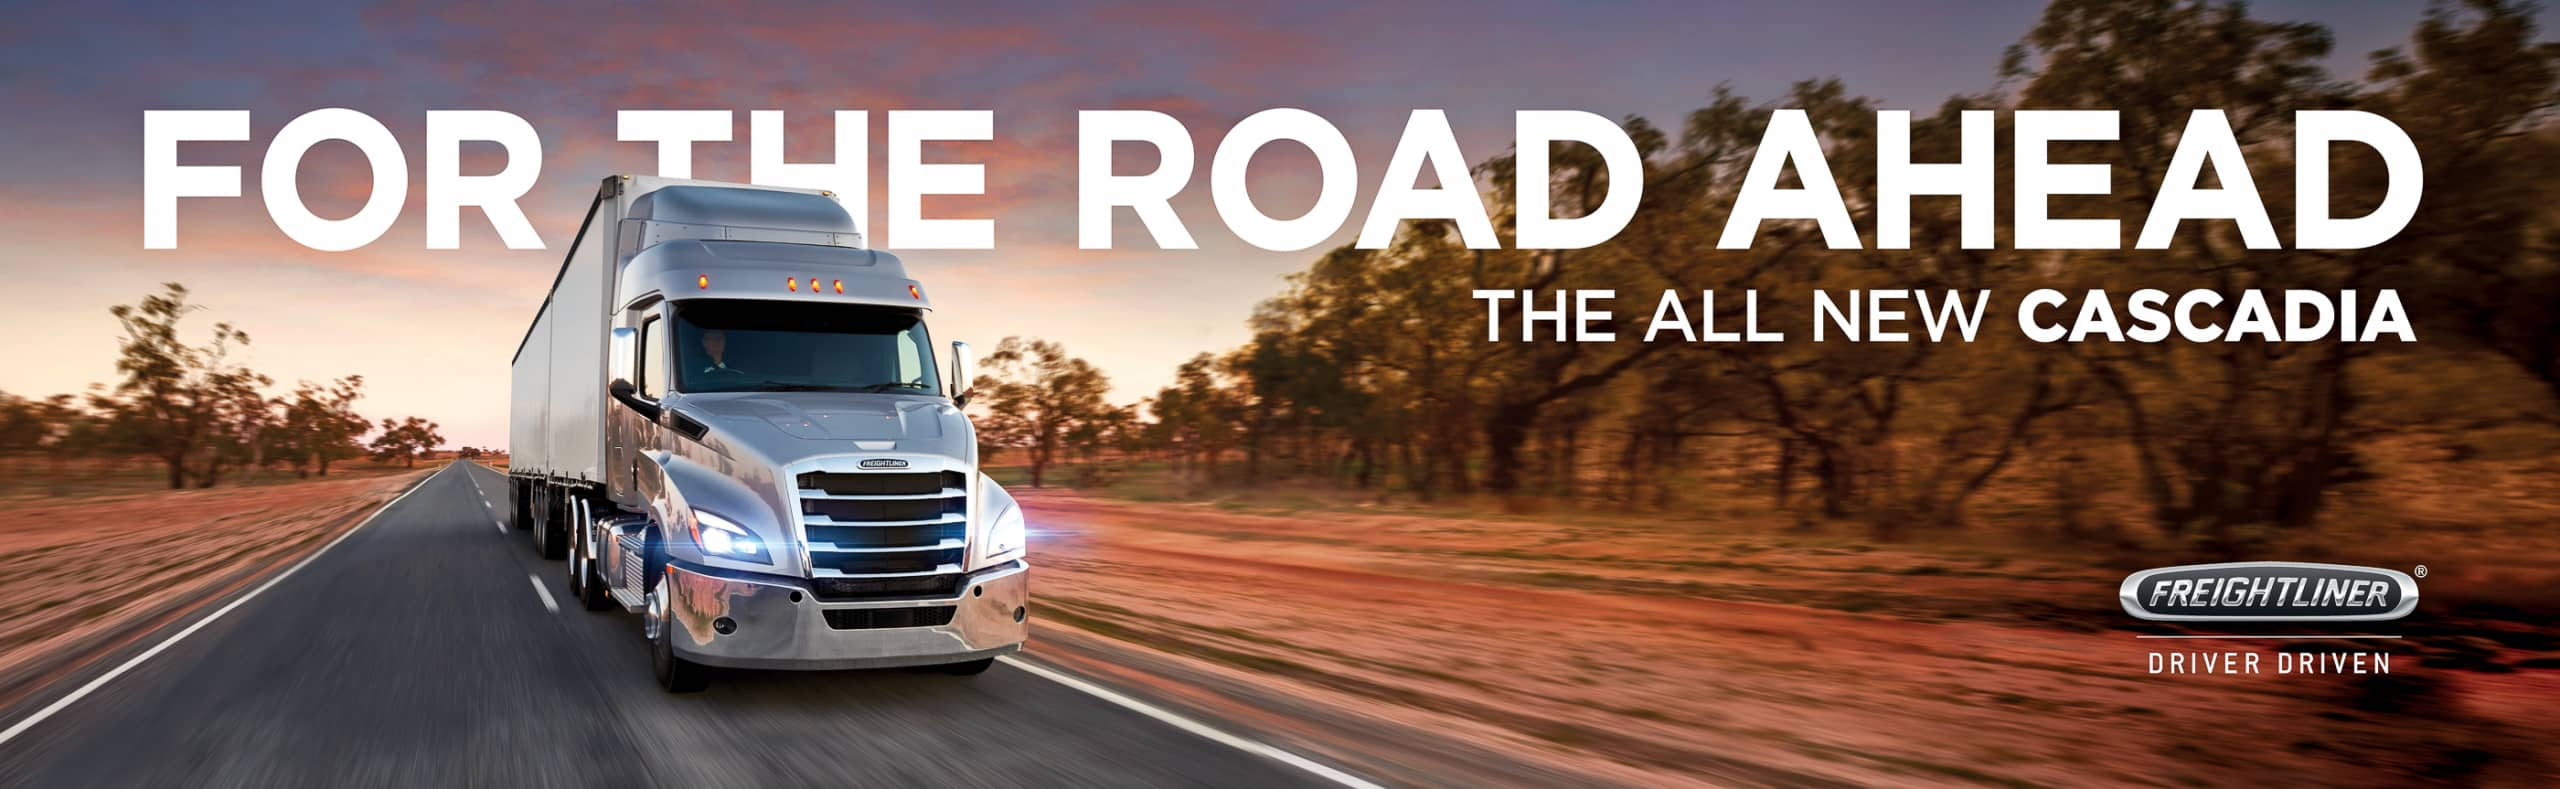 Akkomplice | Freightline Cascadia - For the road ahead